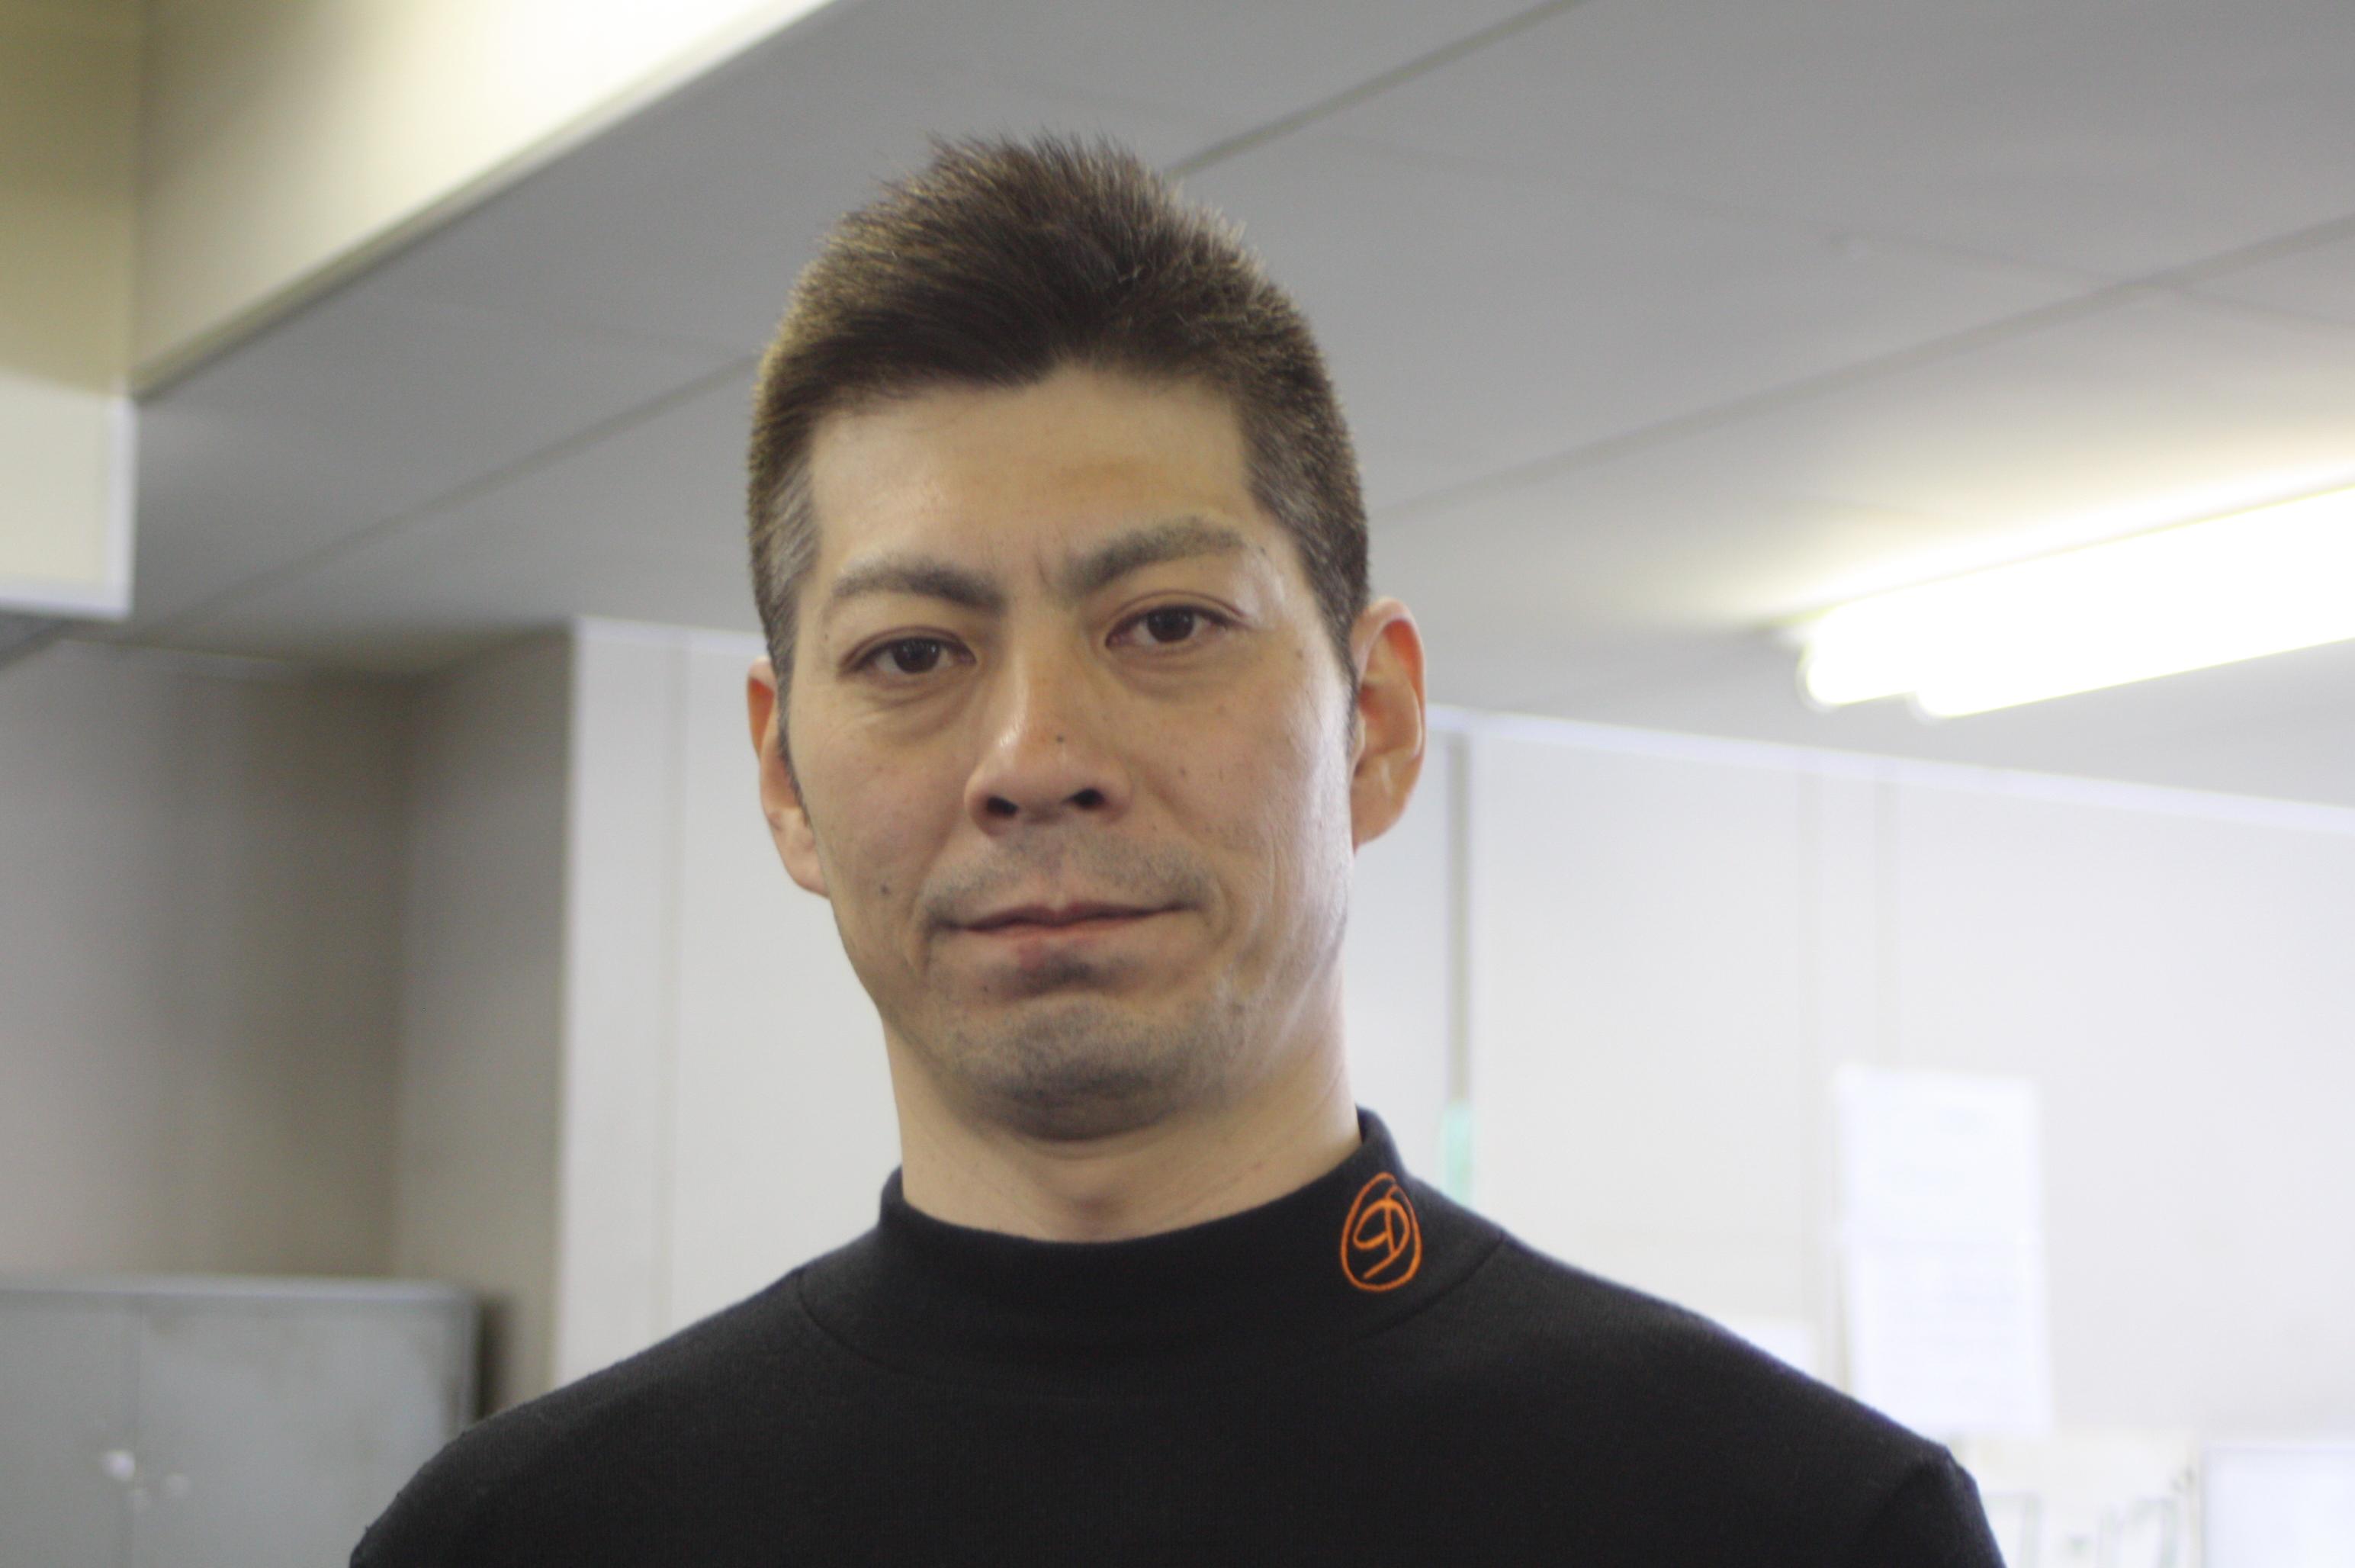 https://www.keirin-saitama.jp/omiya/wp-content/uploads/archives/%E6%B8%A1%E9%82%89%E9%AB%98%E5%BF%97.JPG